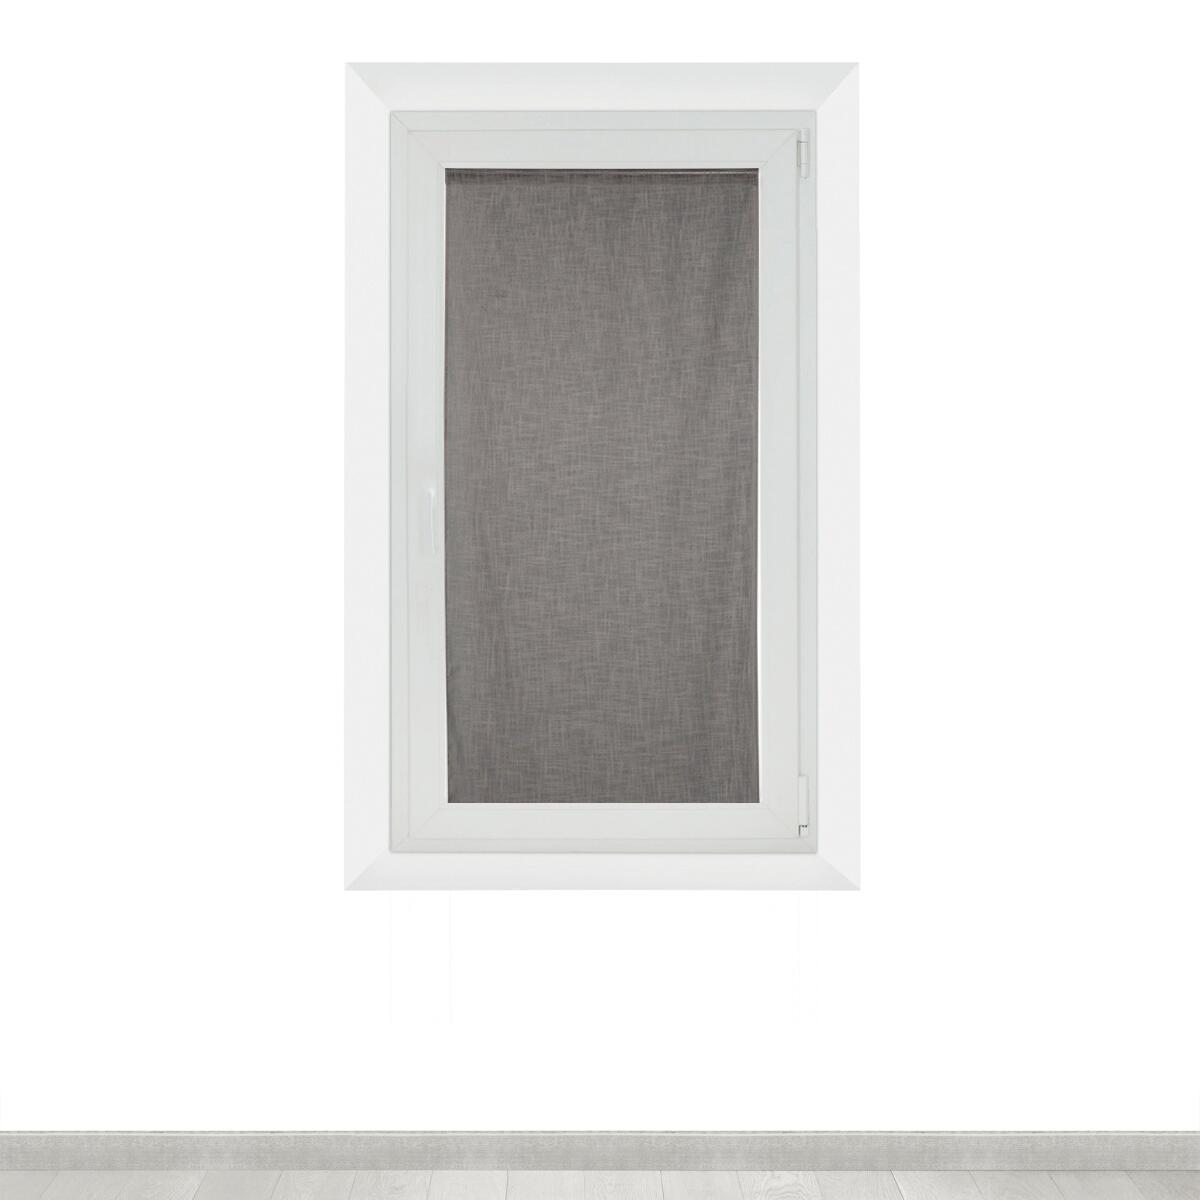 Tendina vetro Infini grigio tunnel 60 x 120 cm - 3